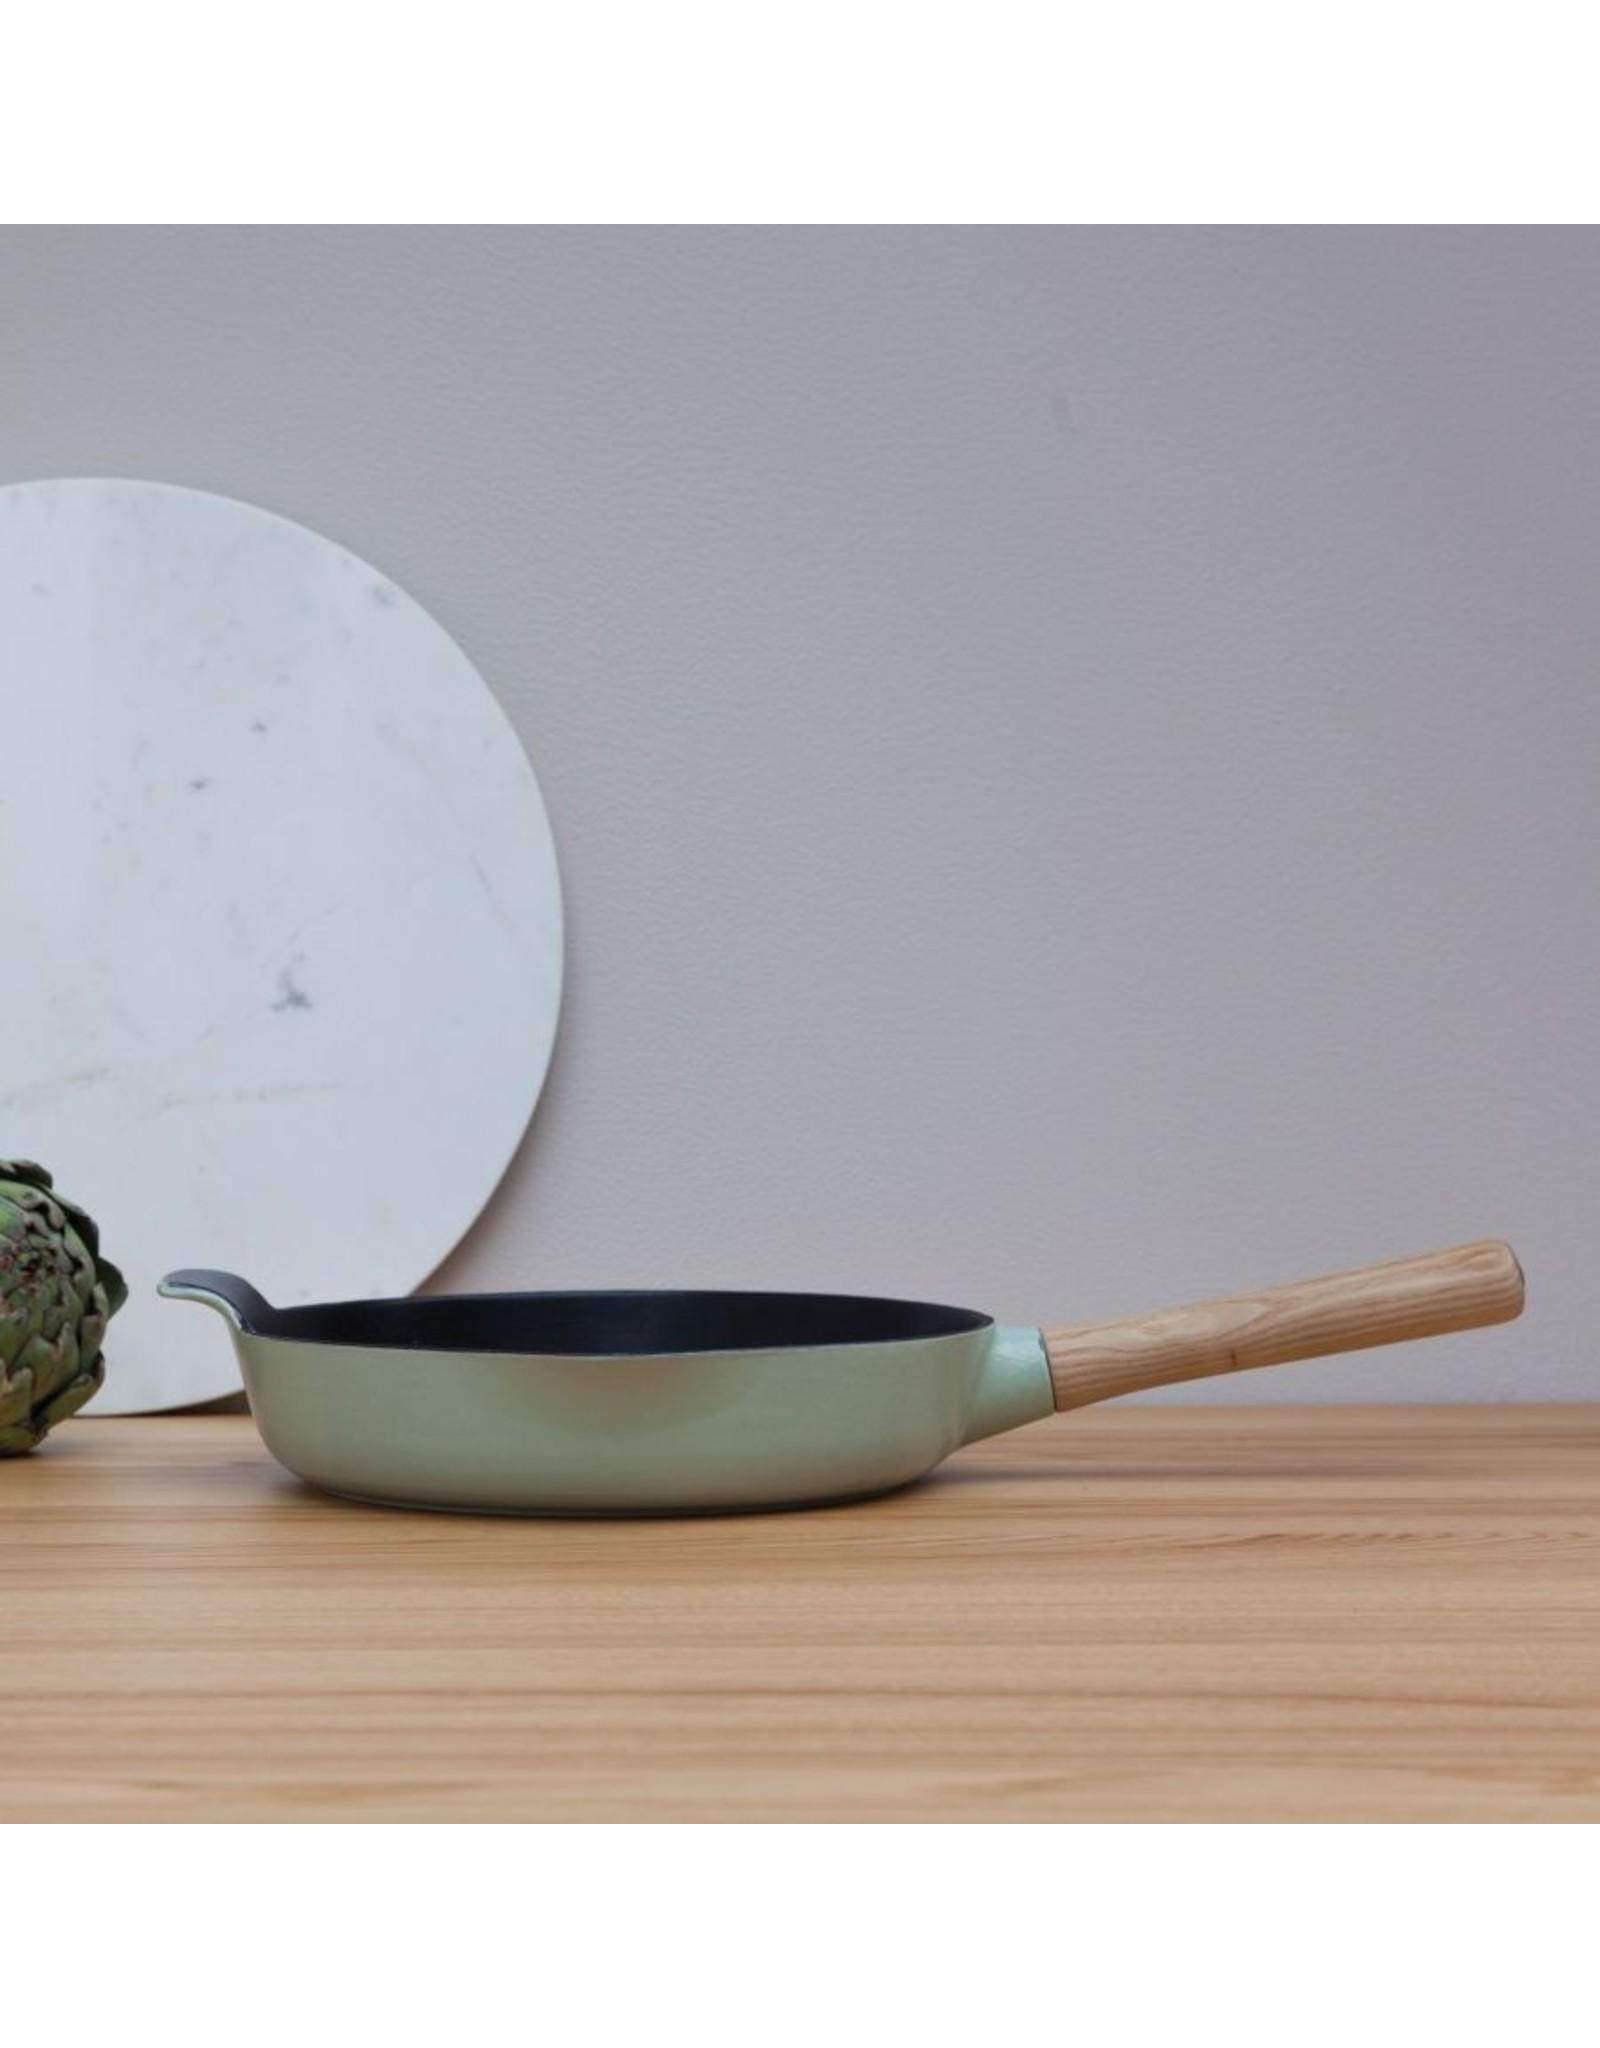 Berghoff Berghoff Braadpan gietijzer groen 26 cm - Ron